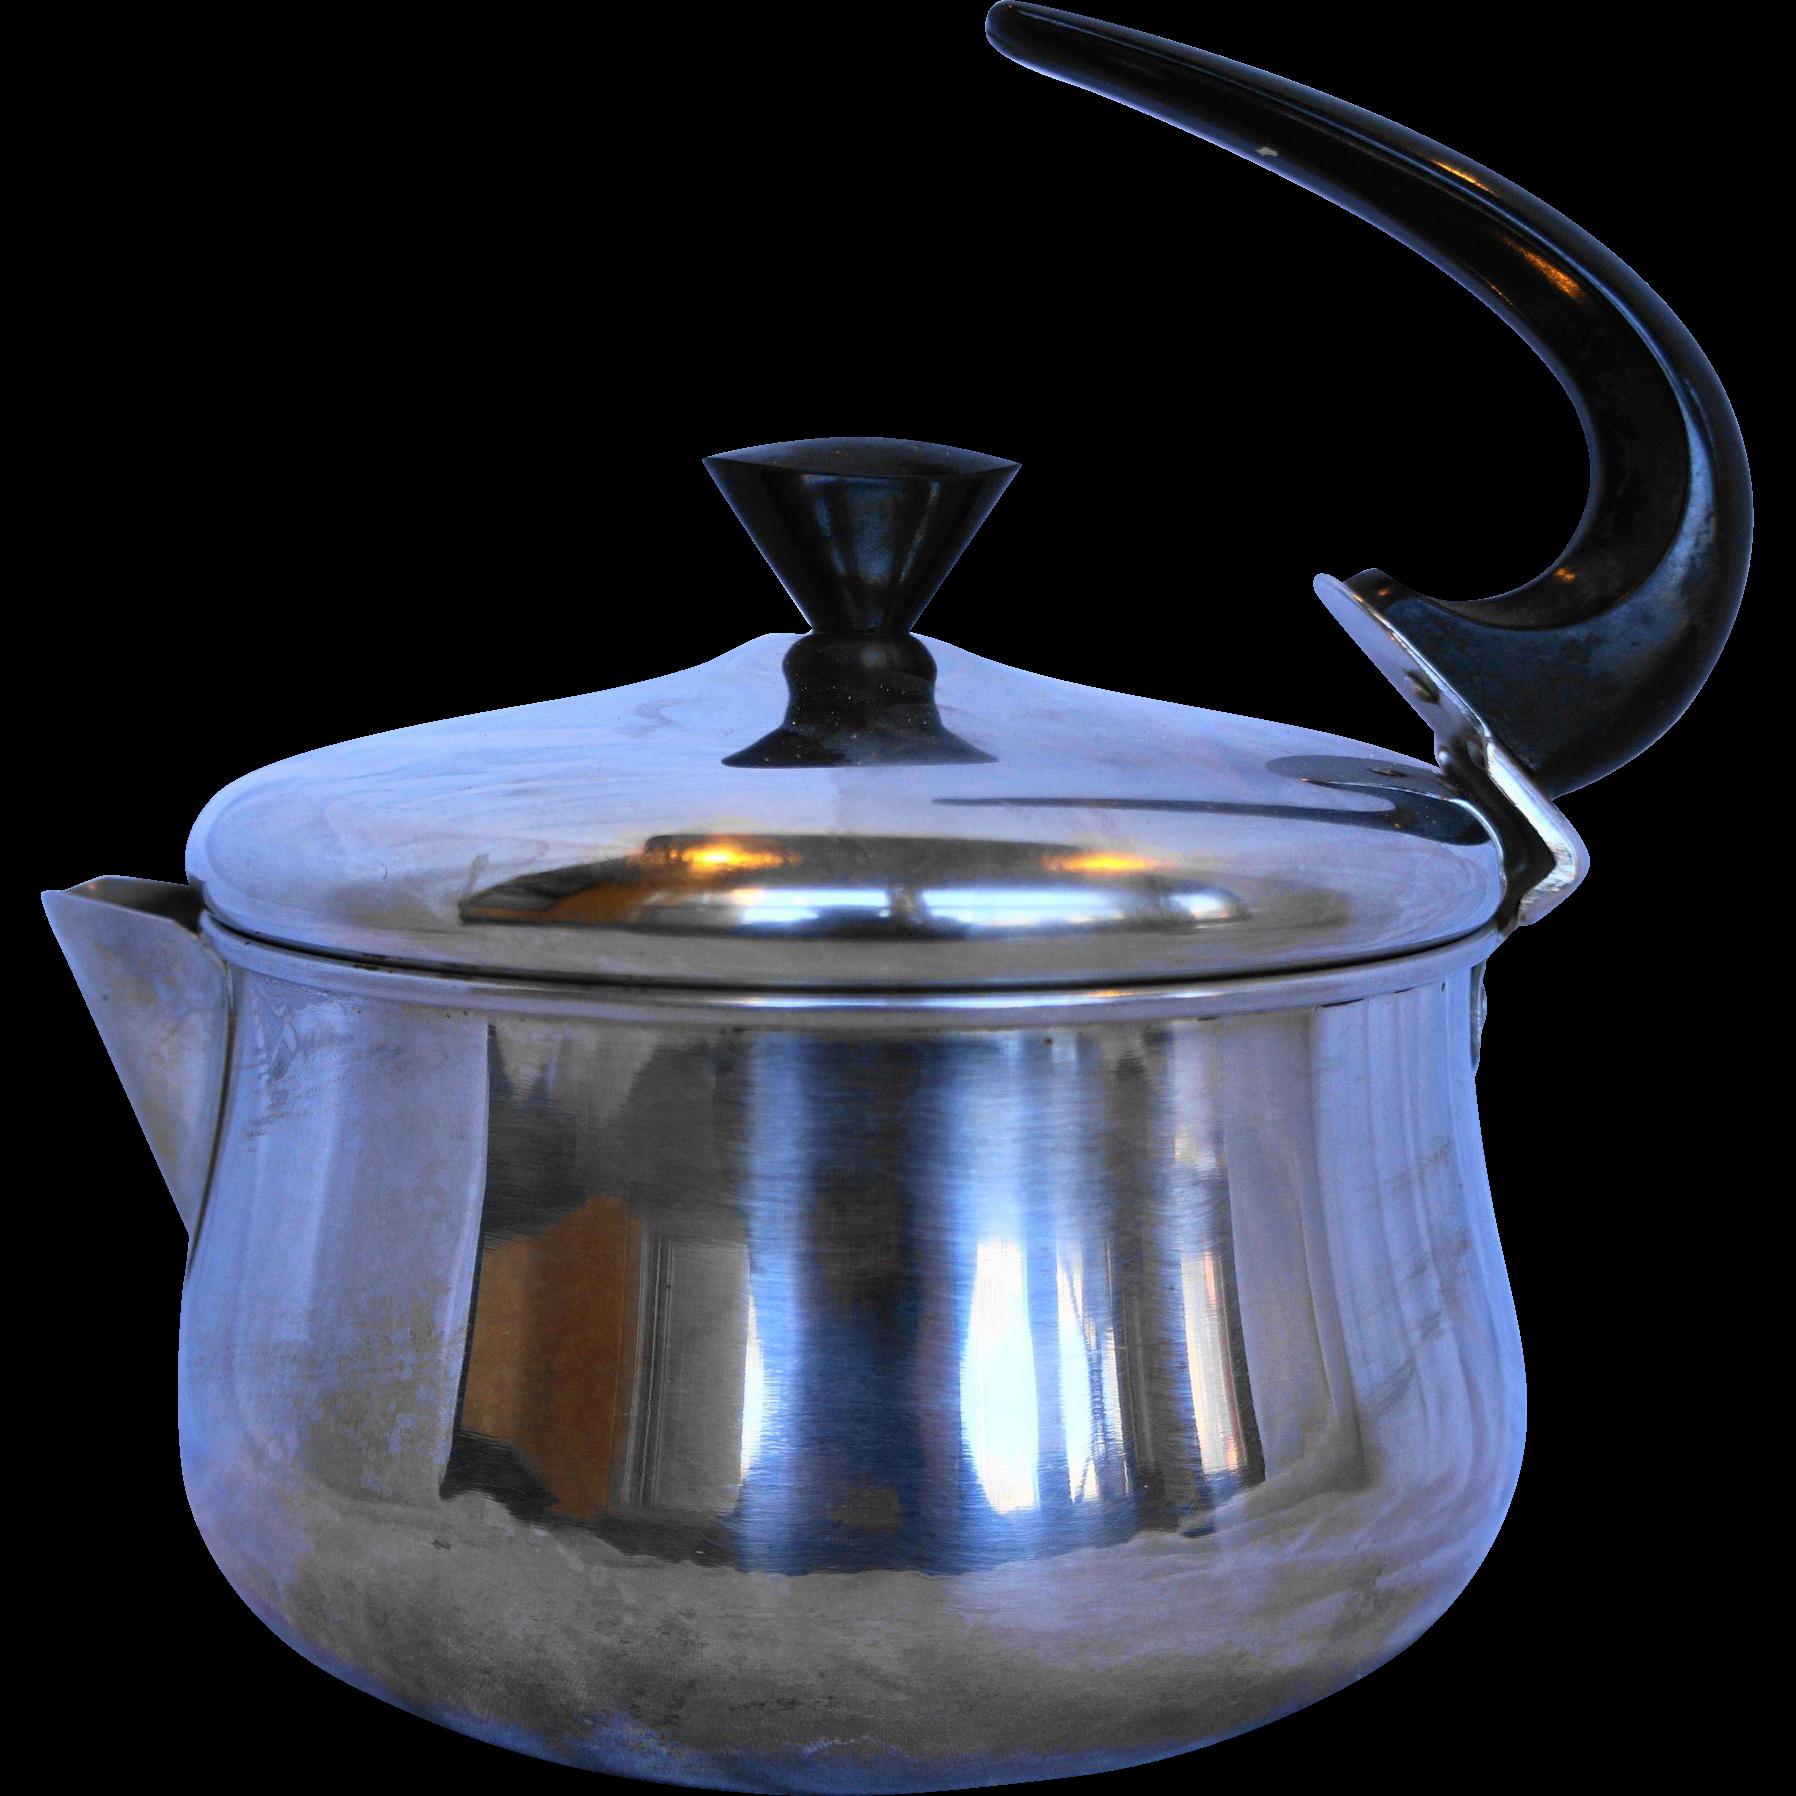 Vintage Farberware Tea Pot - 2 qt. Stainless Steel Tea Kettle 762